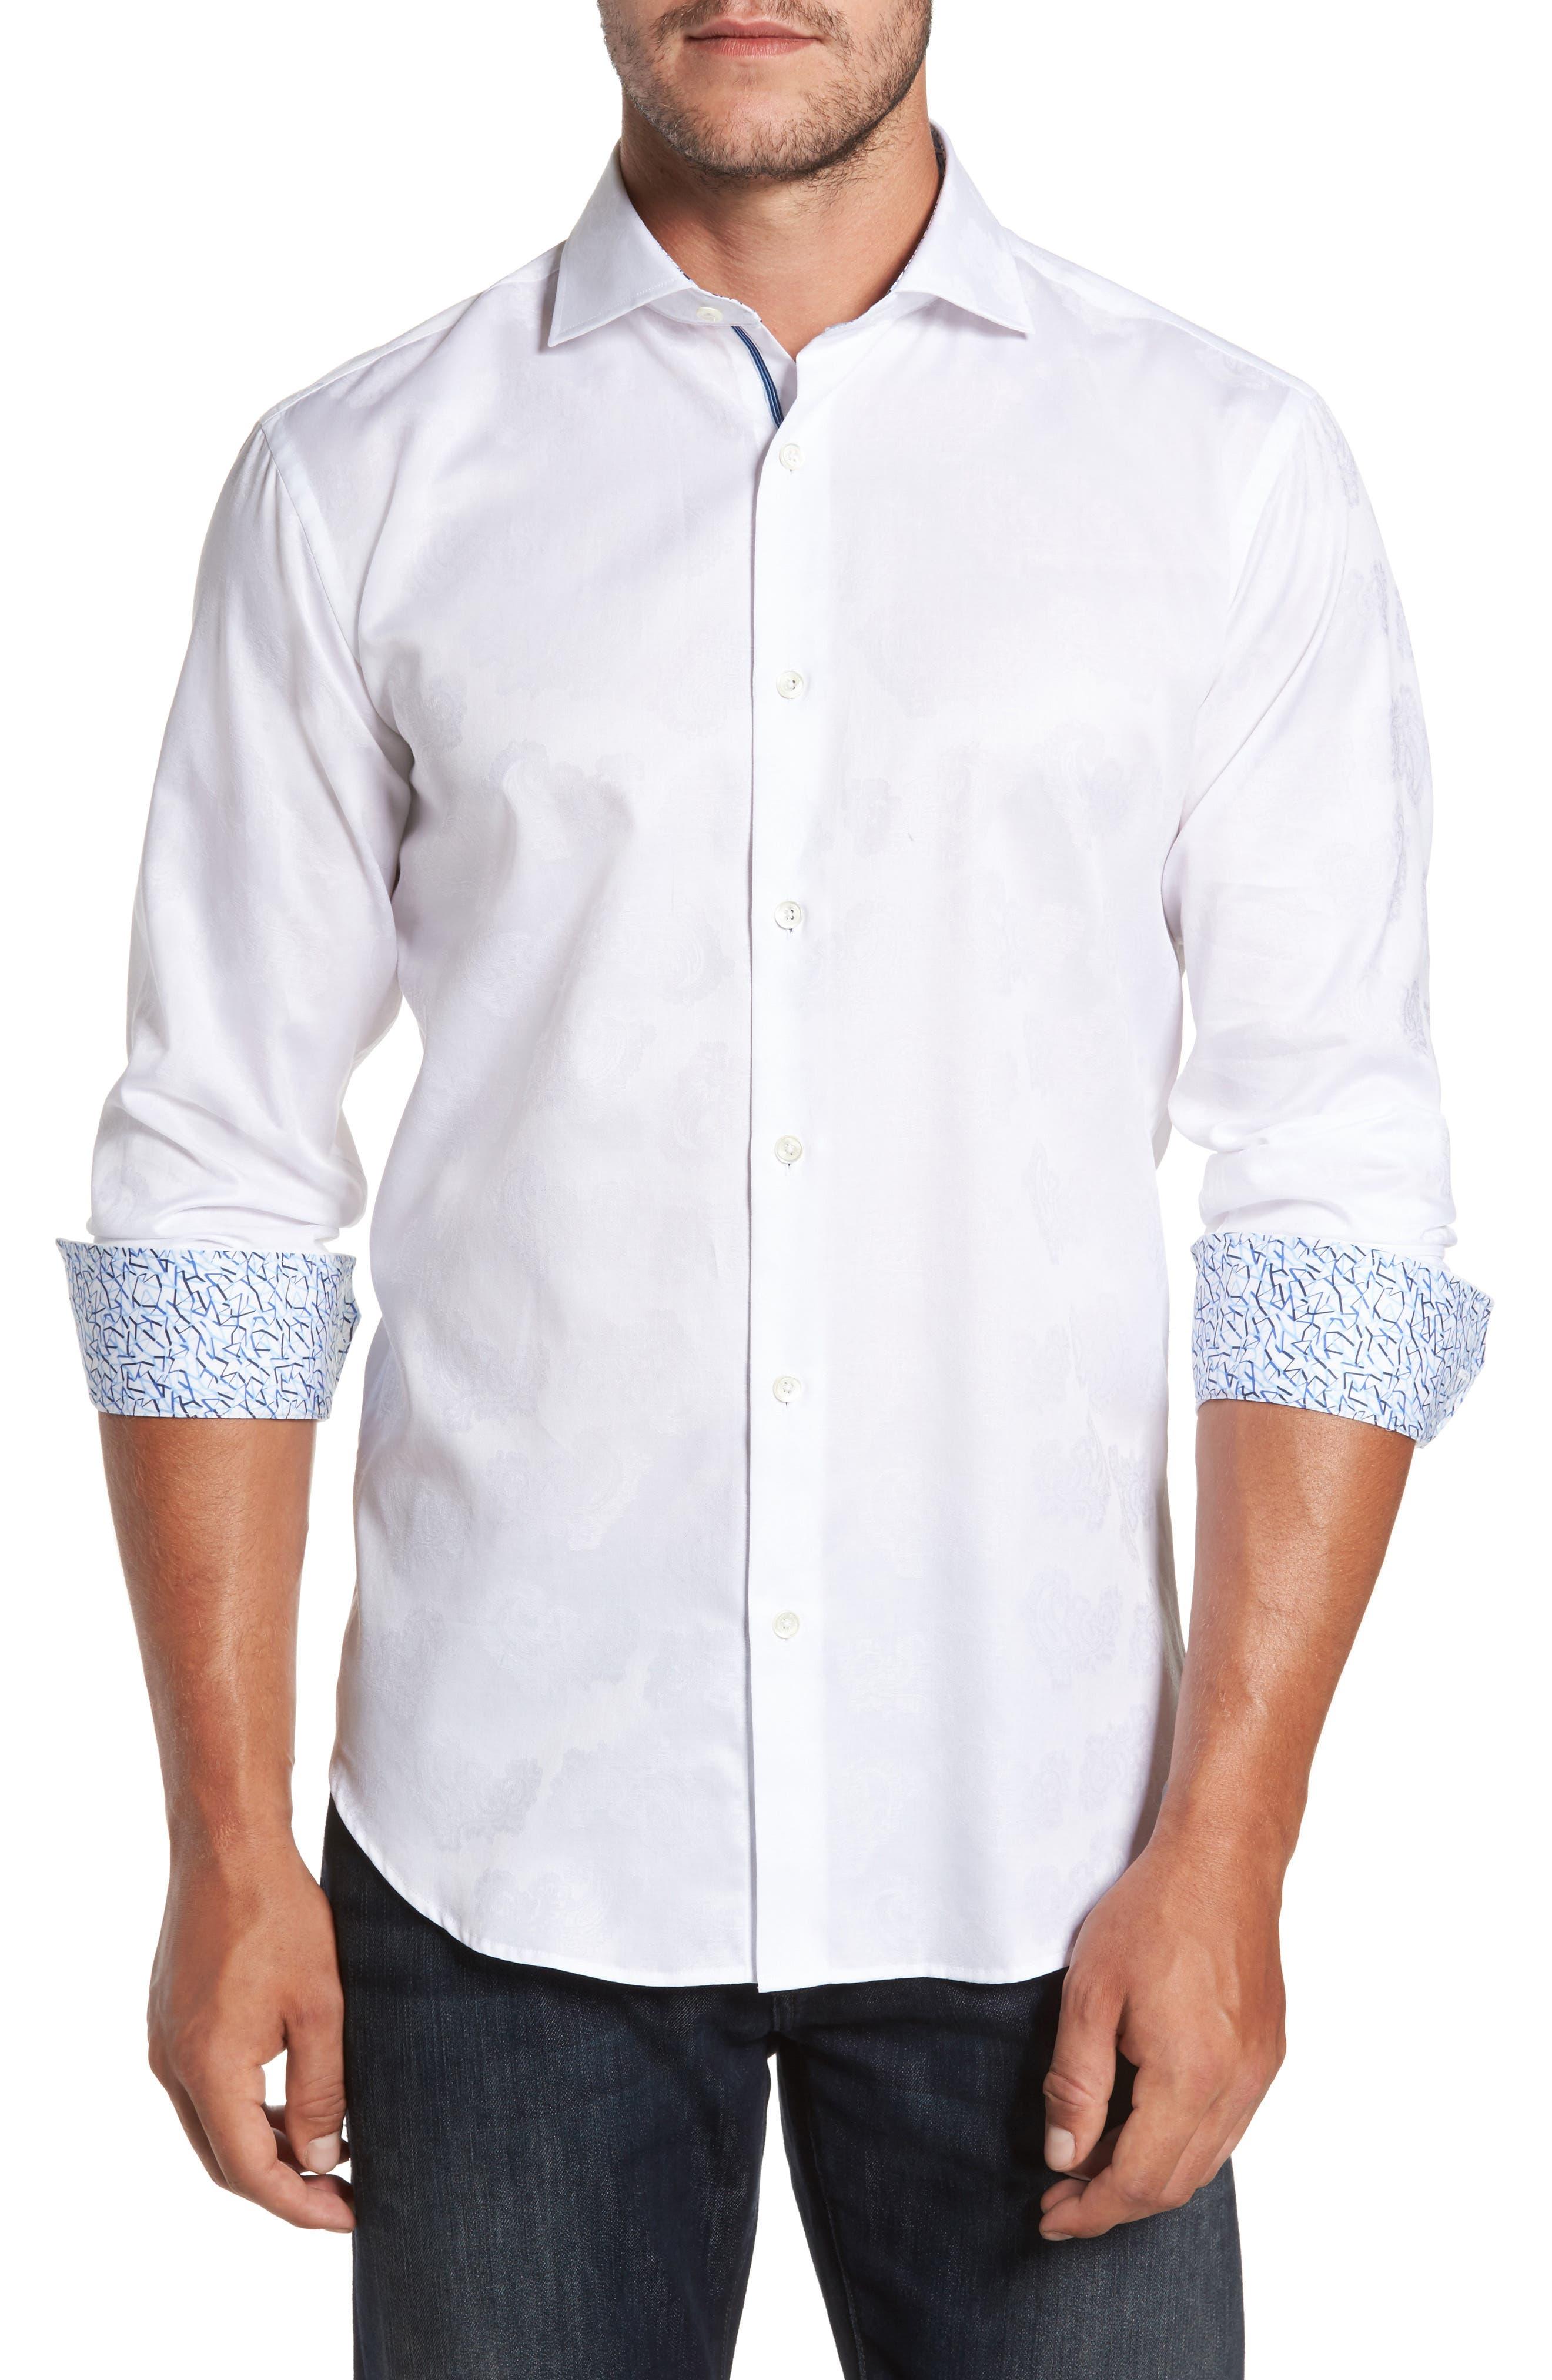 Alternate Image 1 Selected - Bugatchi Trim Fit Floral Jacquard Sport Shirt